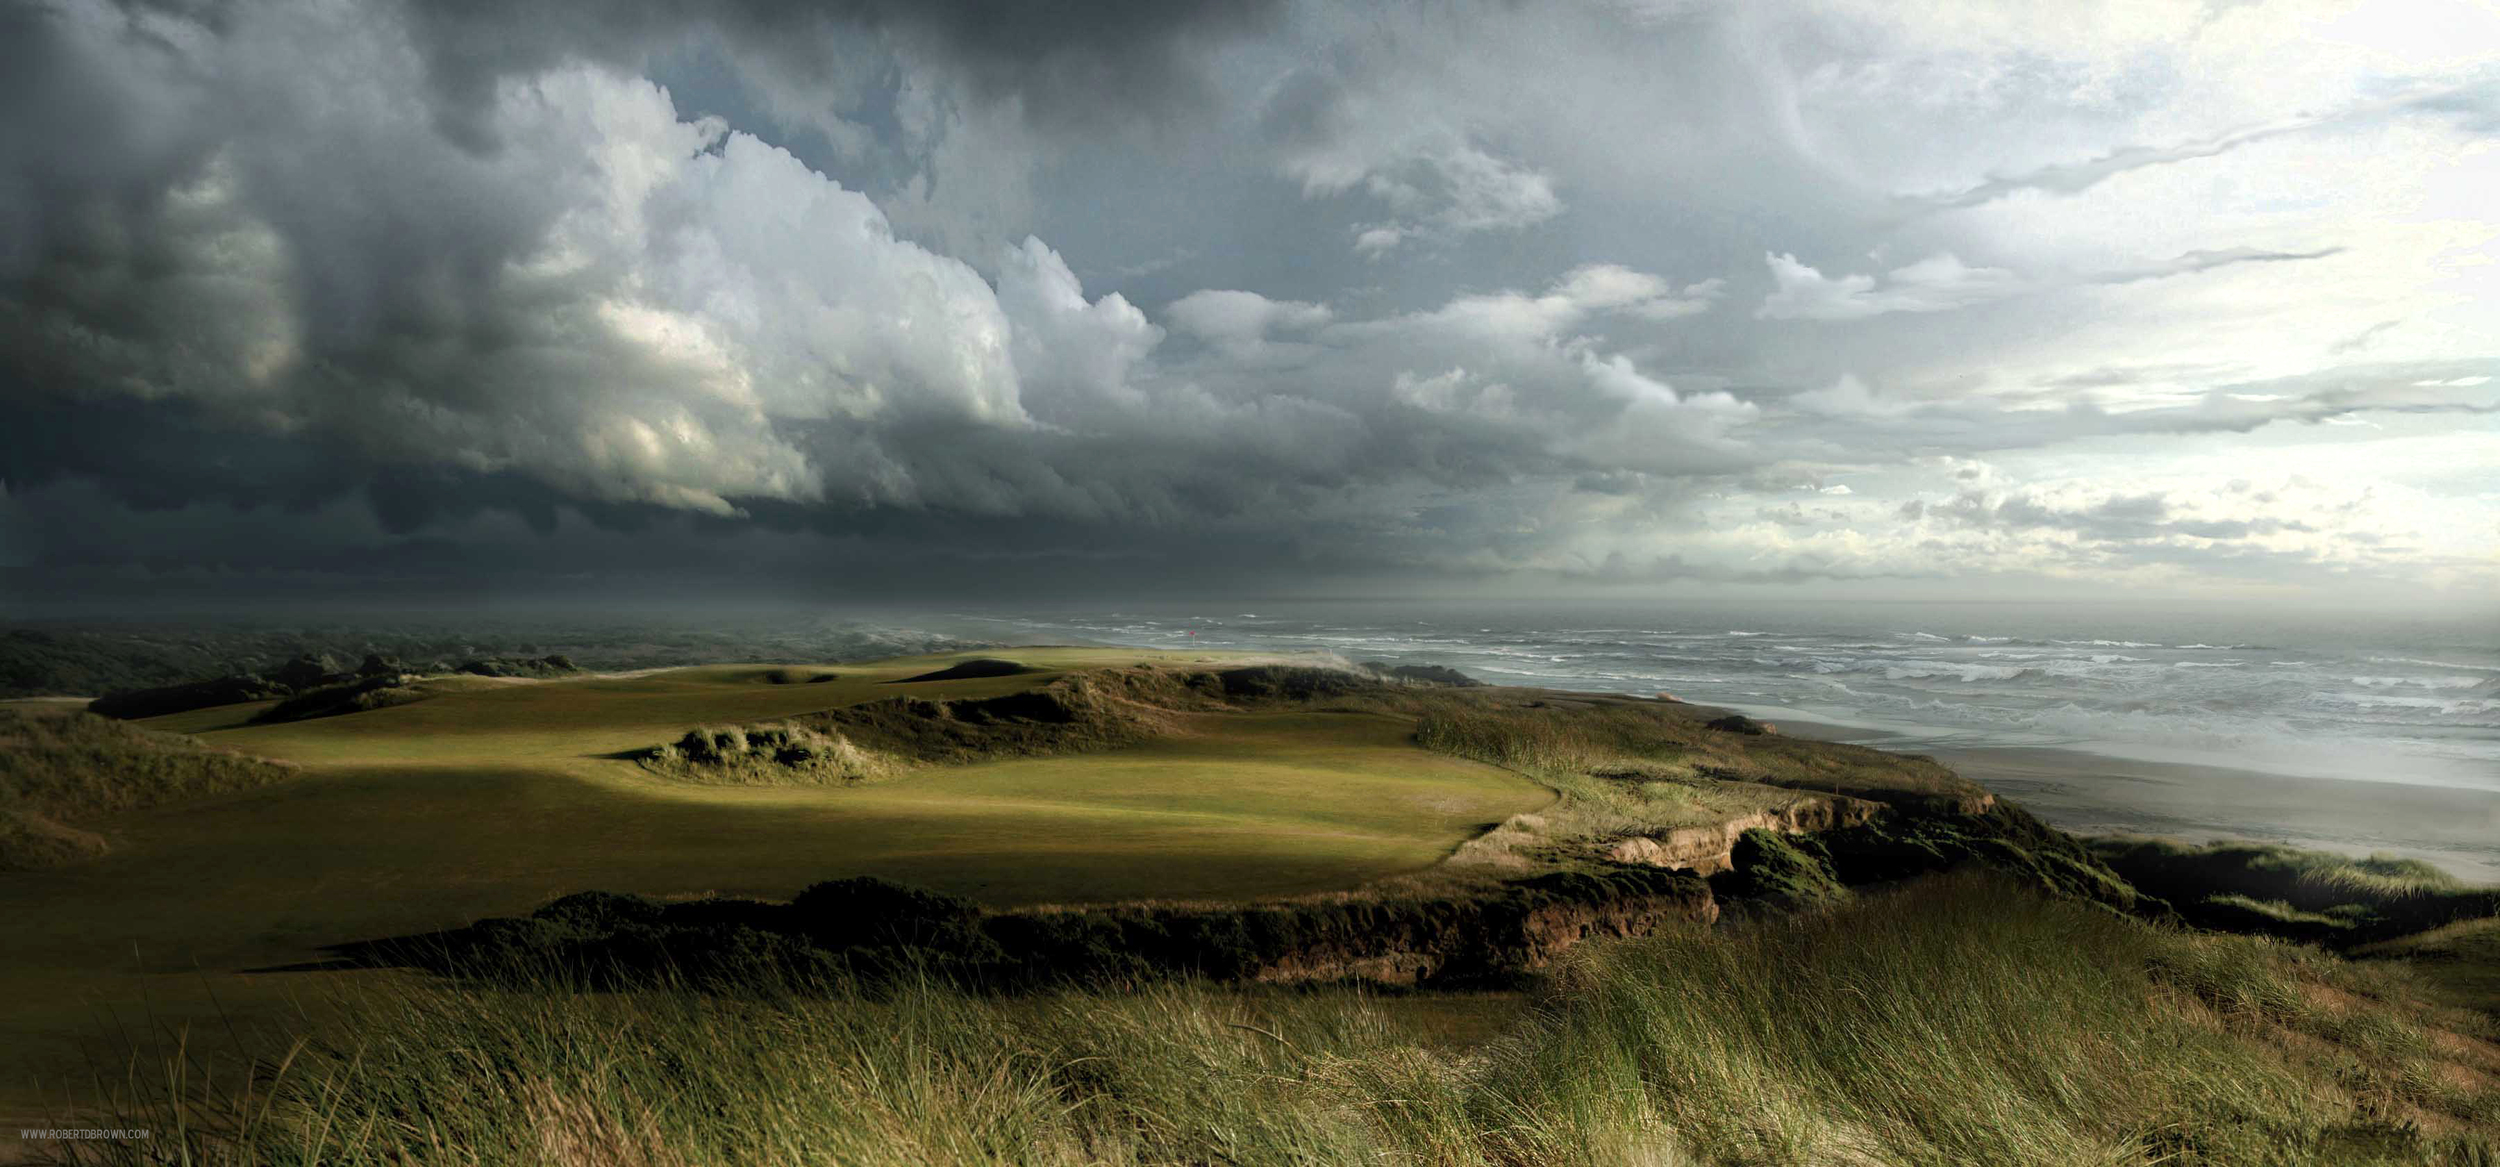 16th hole sandtrap version 5_v03.jpg